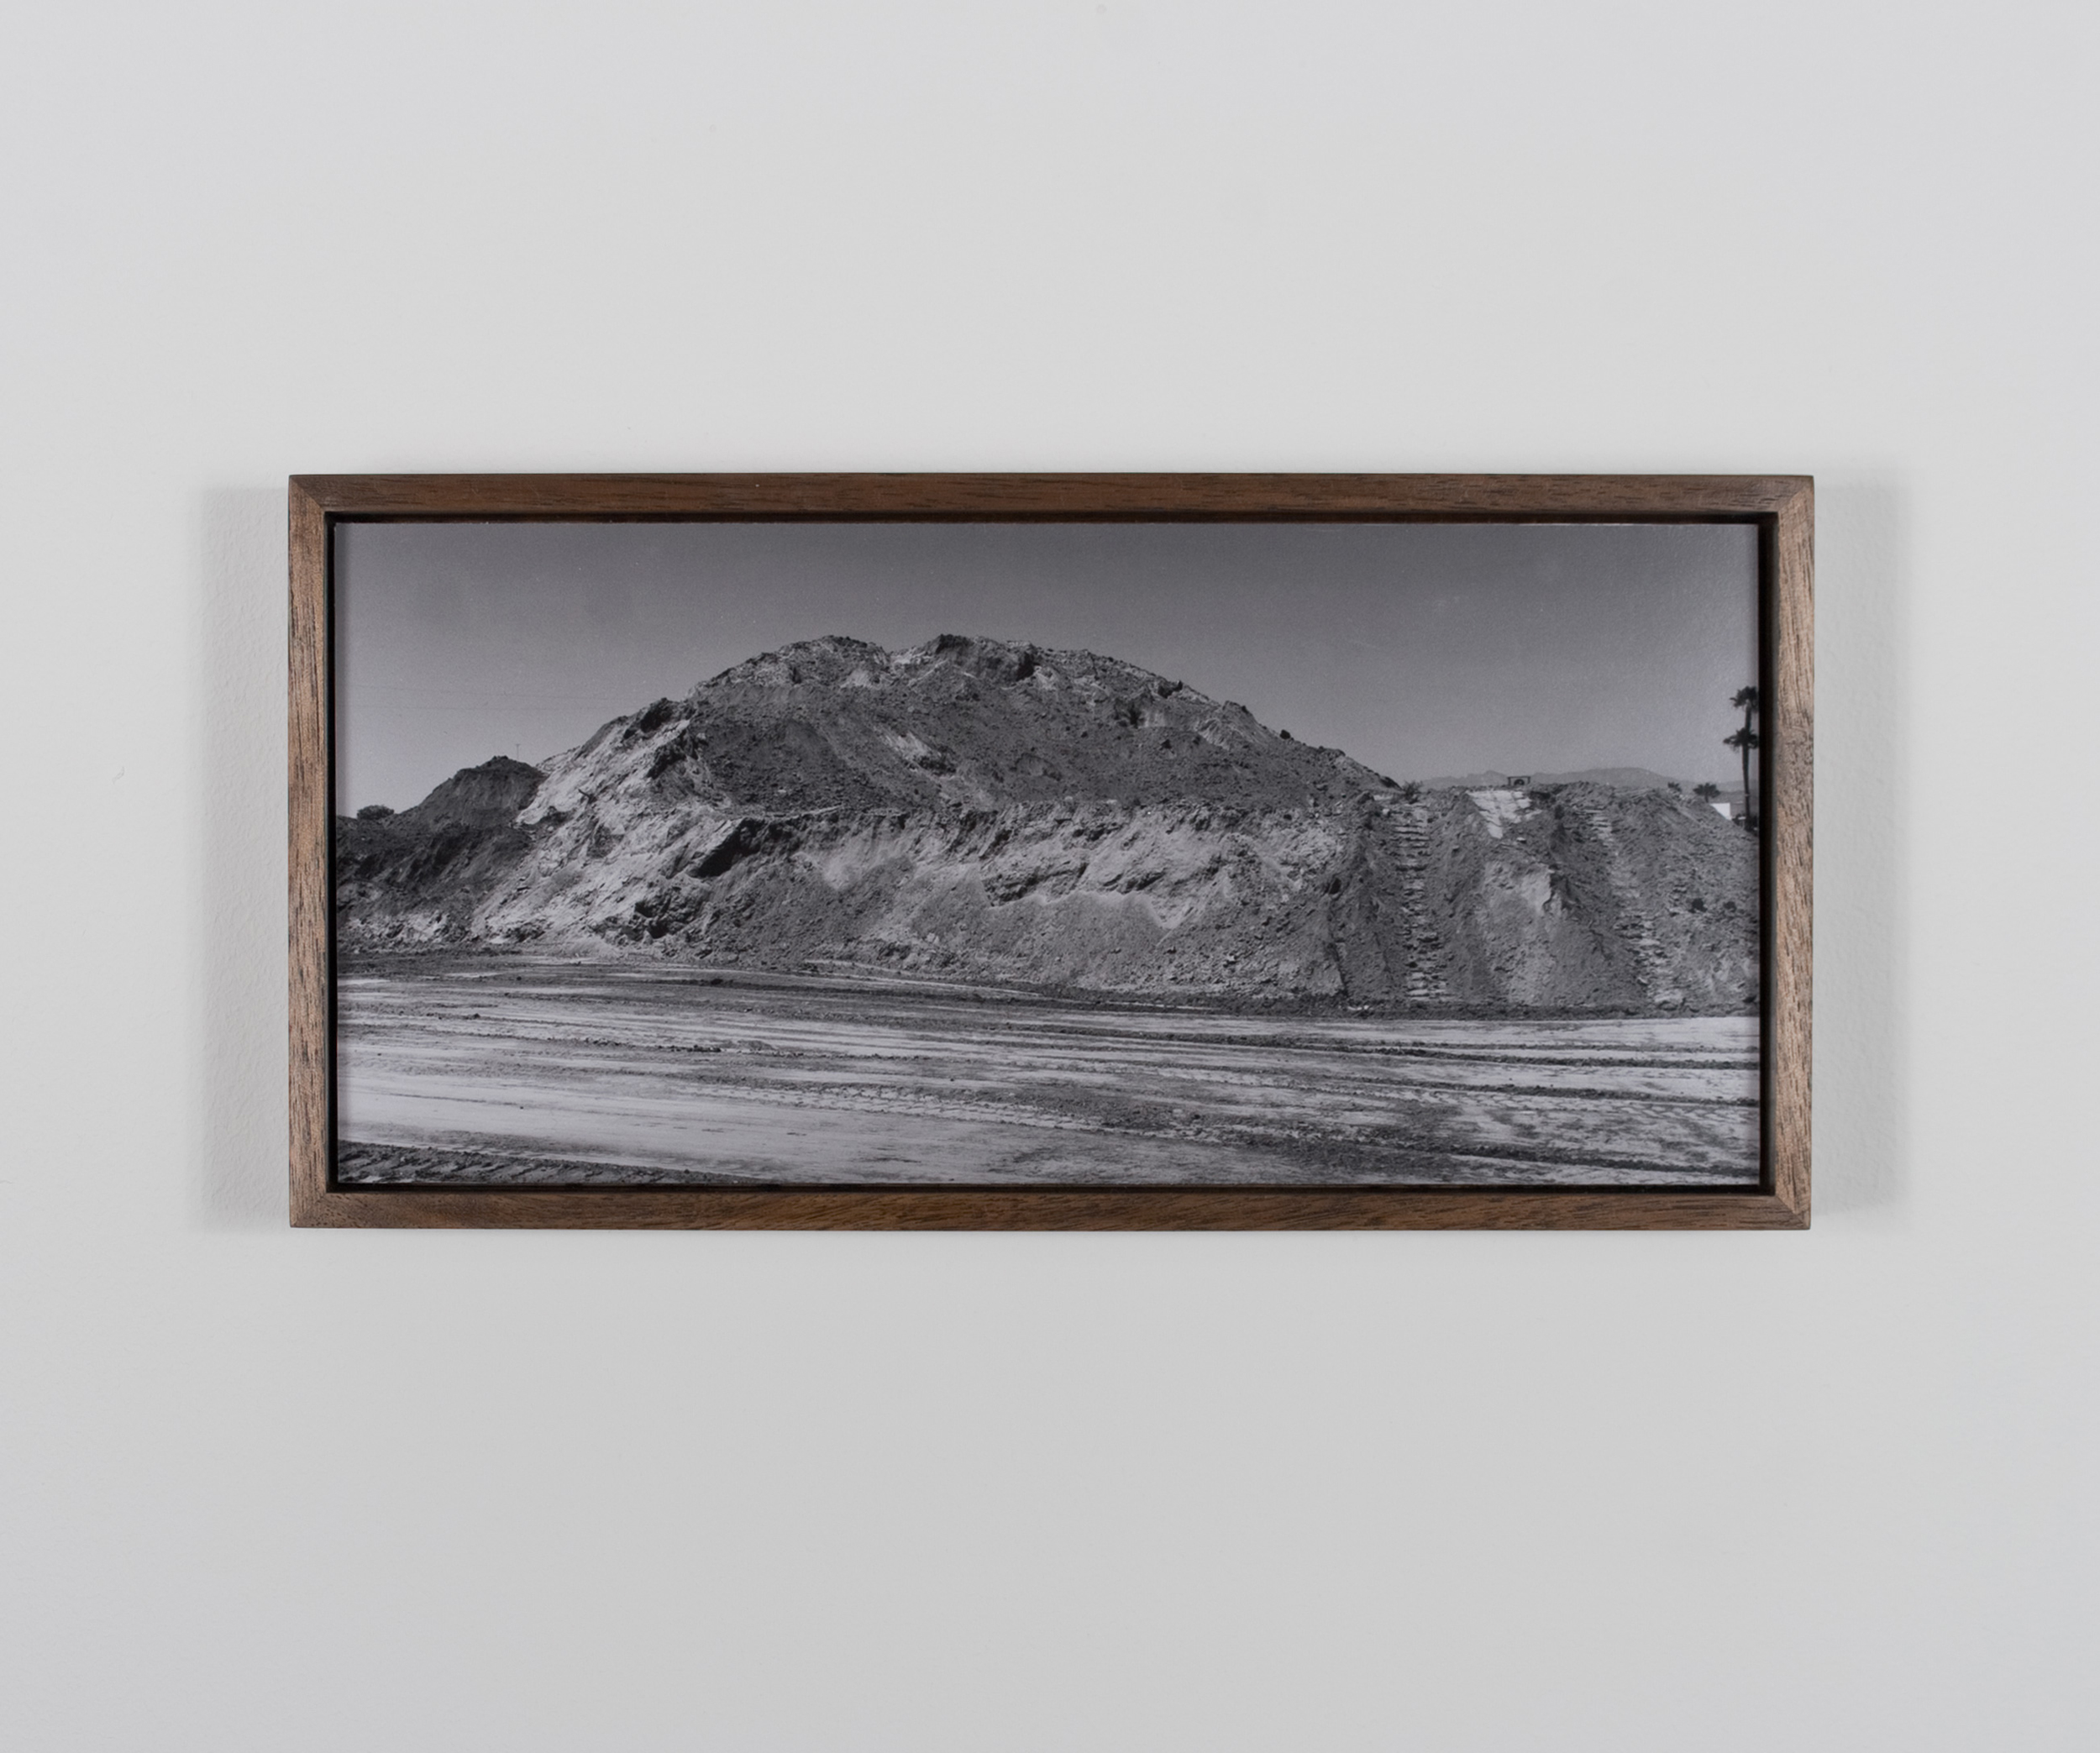 Venal Butte 2009/10 Gelatin-silver print on Dibond, with walnut frame